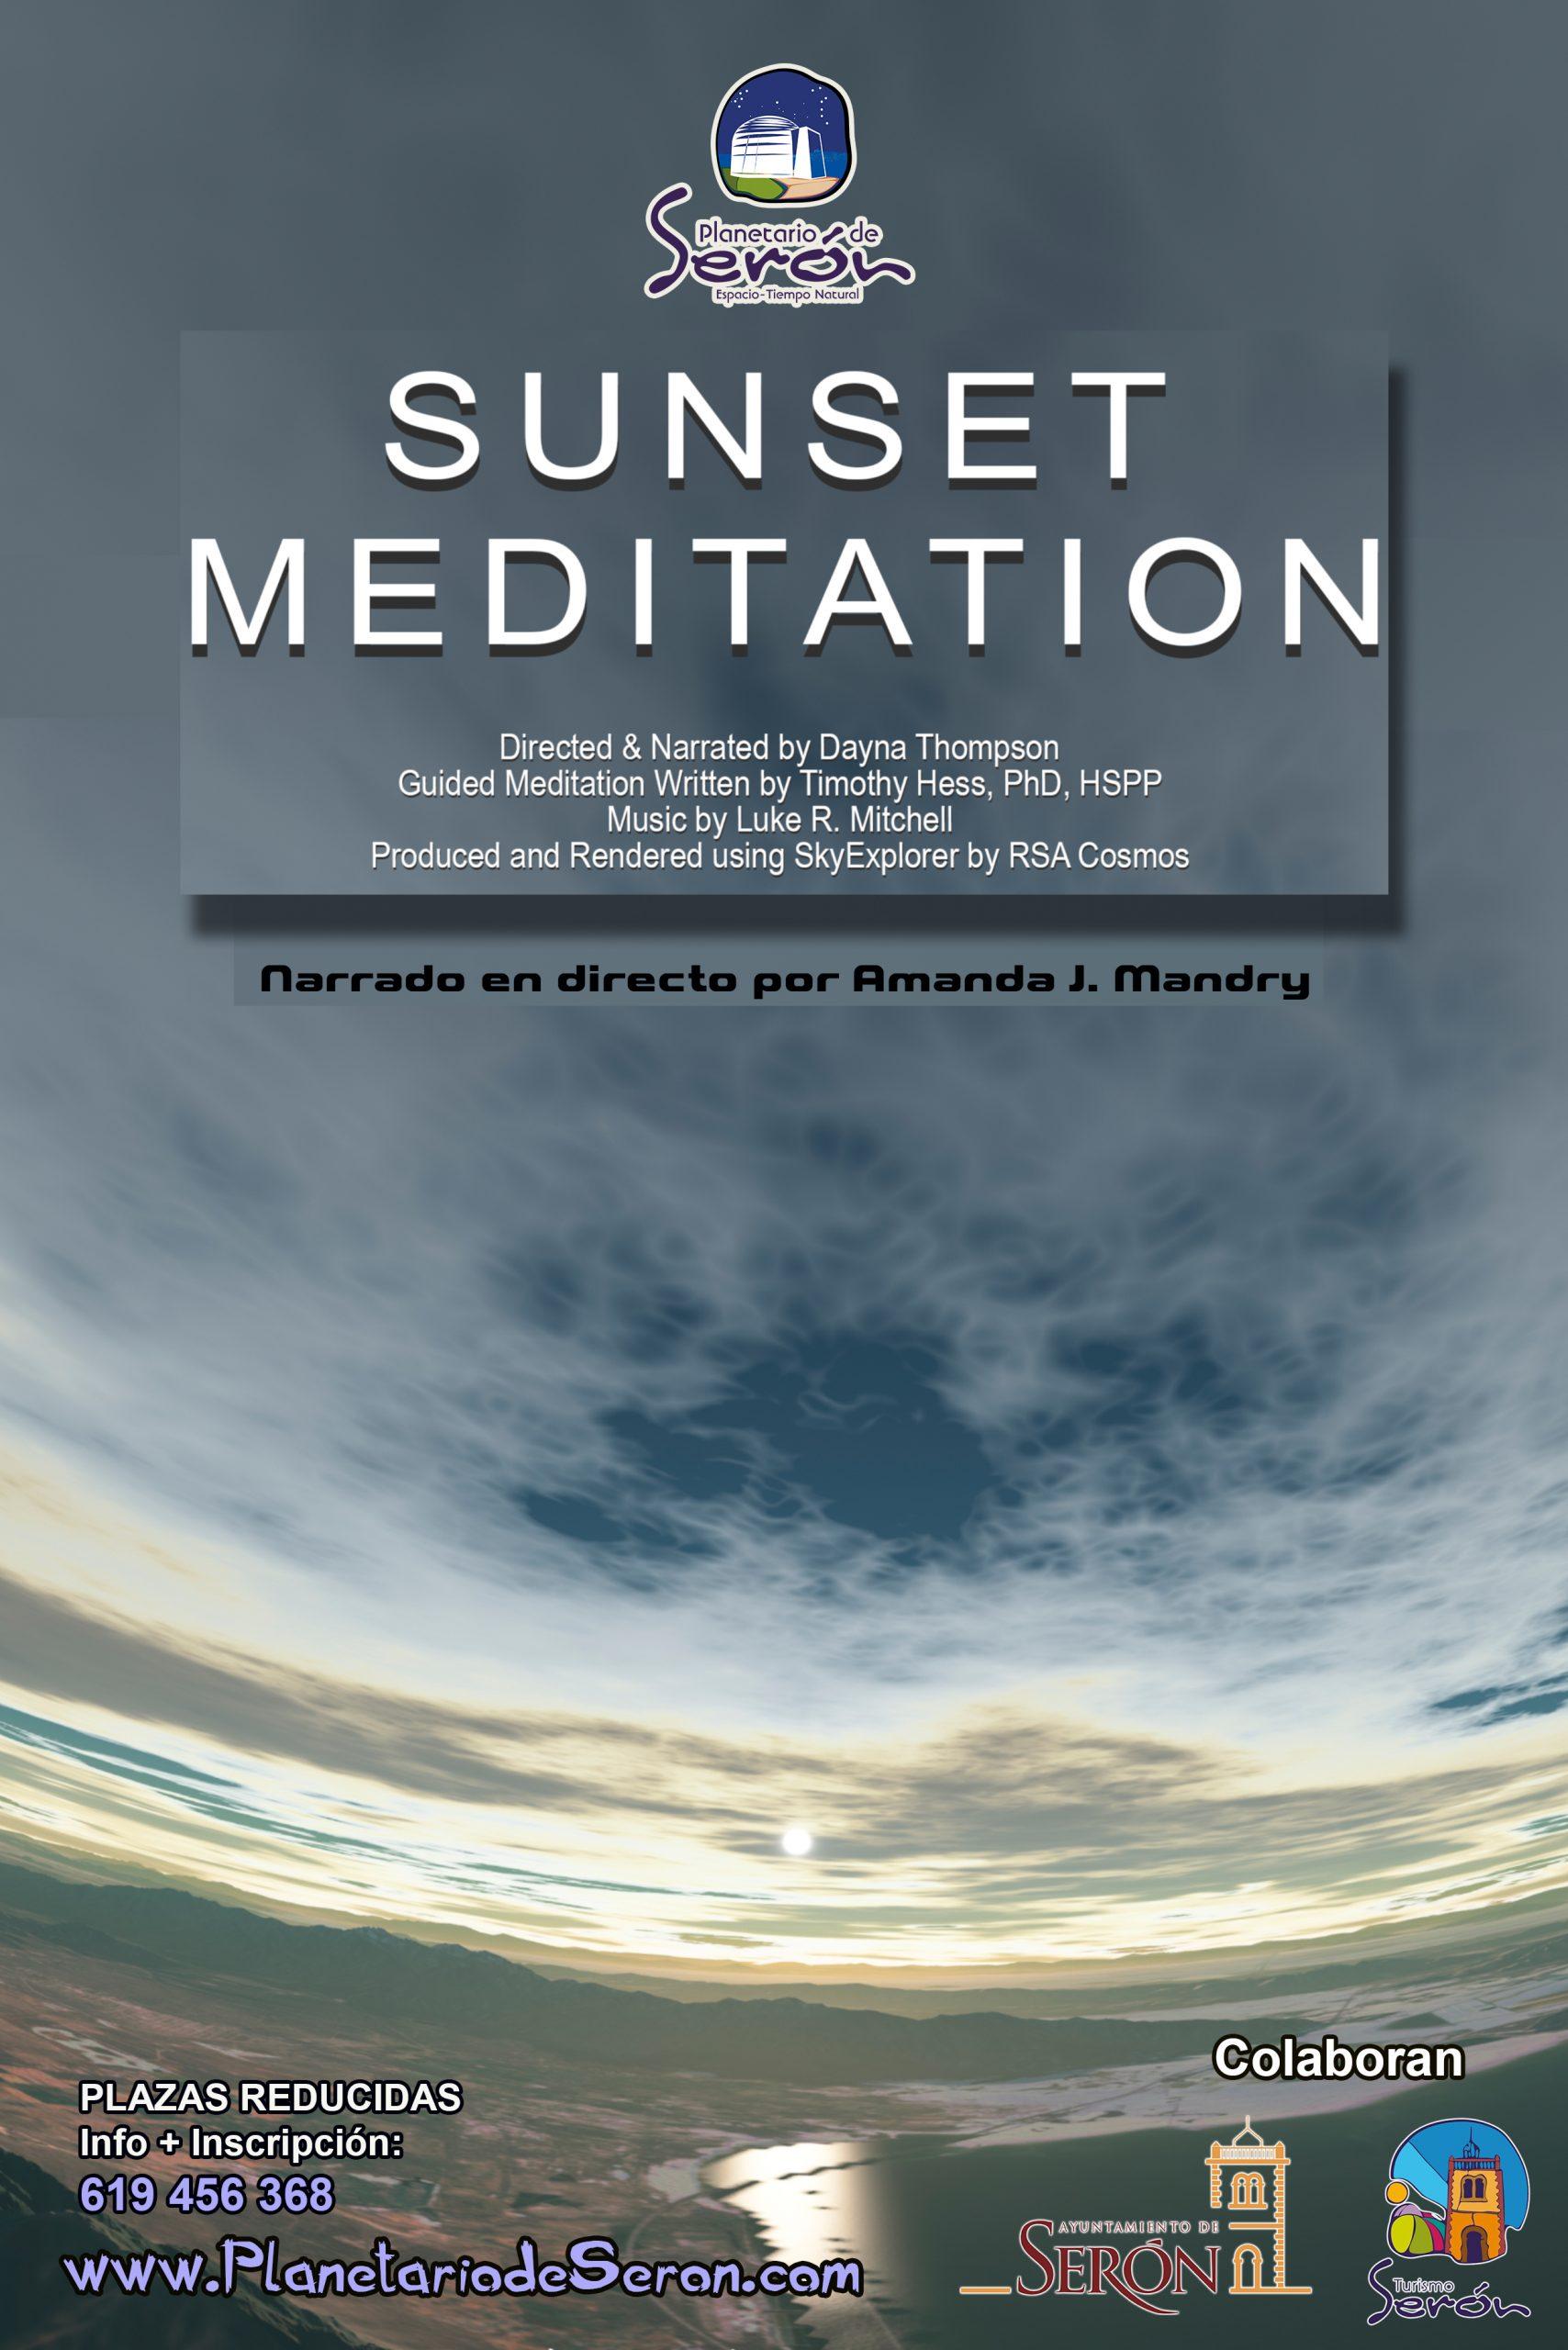 sunset meditation planetario de Serón Almería